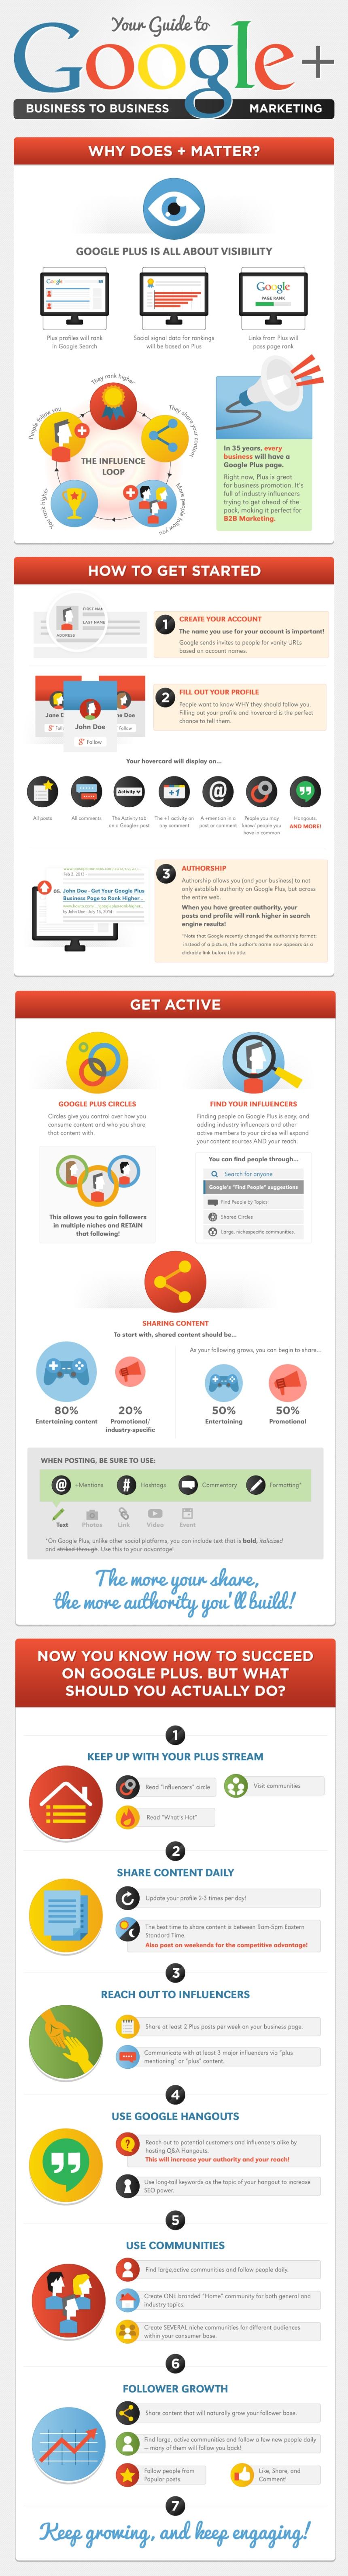 Guía de Google + para B2B marketing